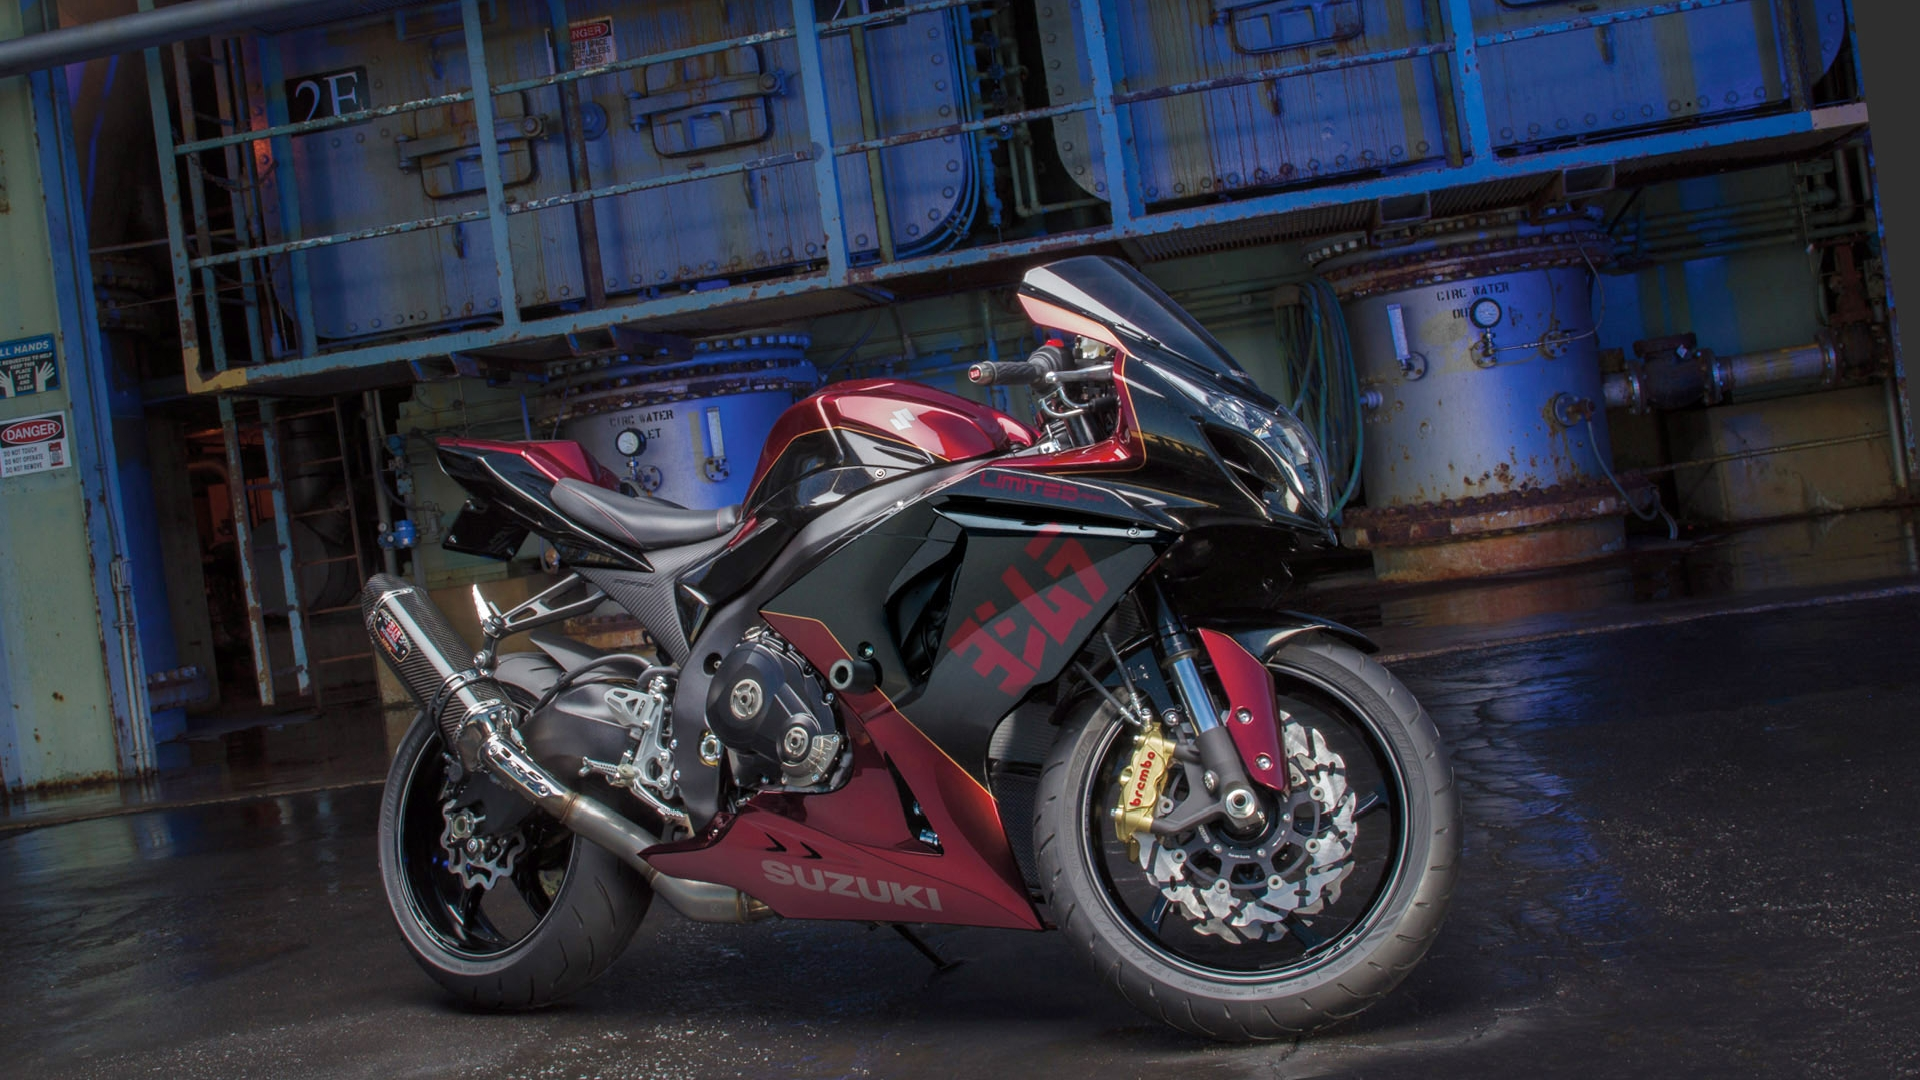 Yamaha Electric Motorcycle >> 2013 Yoshimura Limited Edition Suzuki GSX-R [Video ...